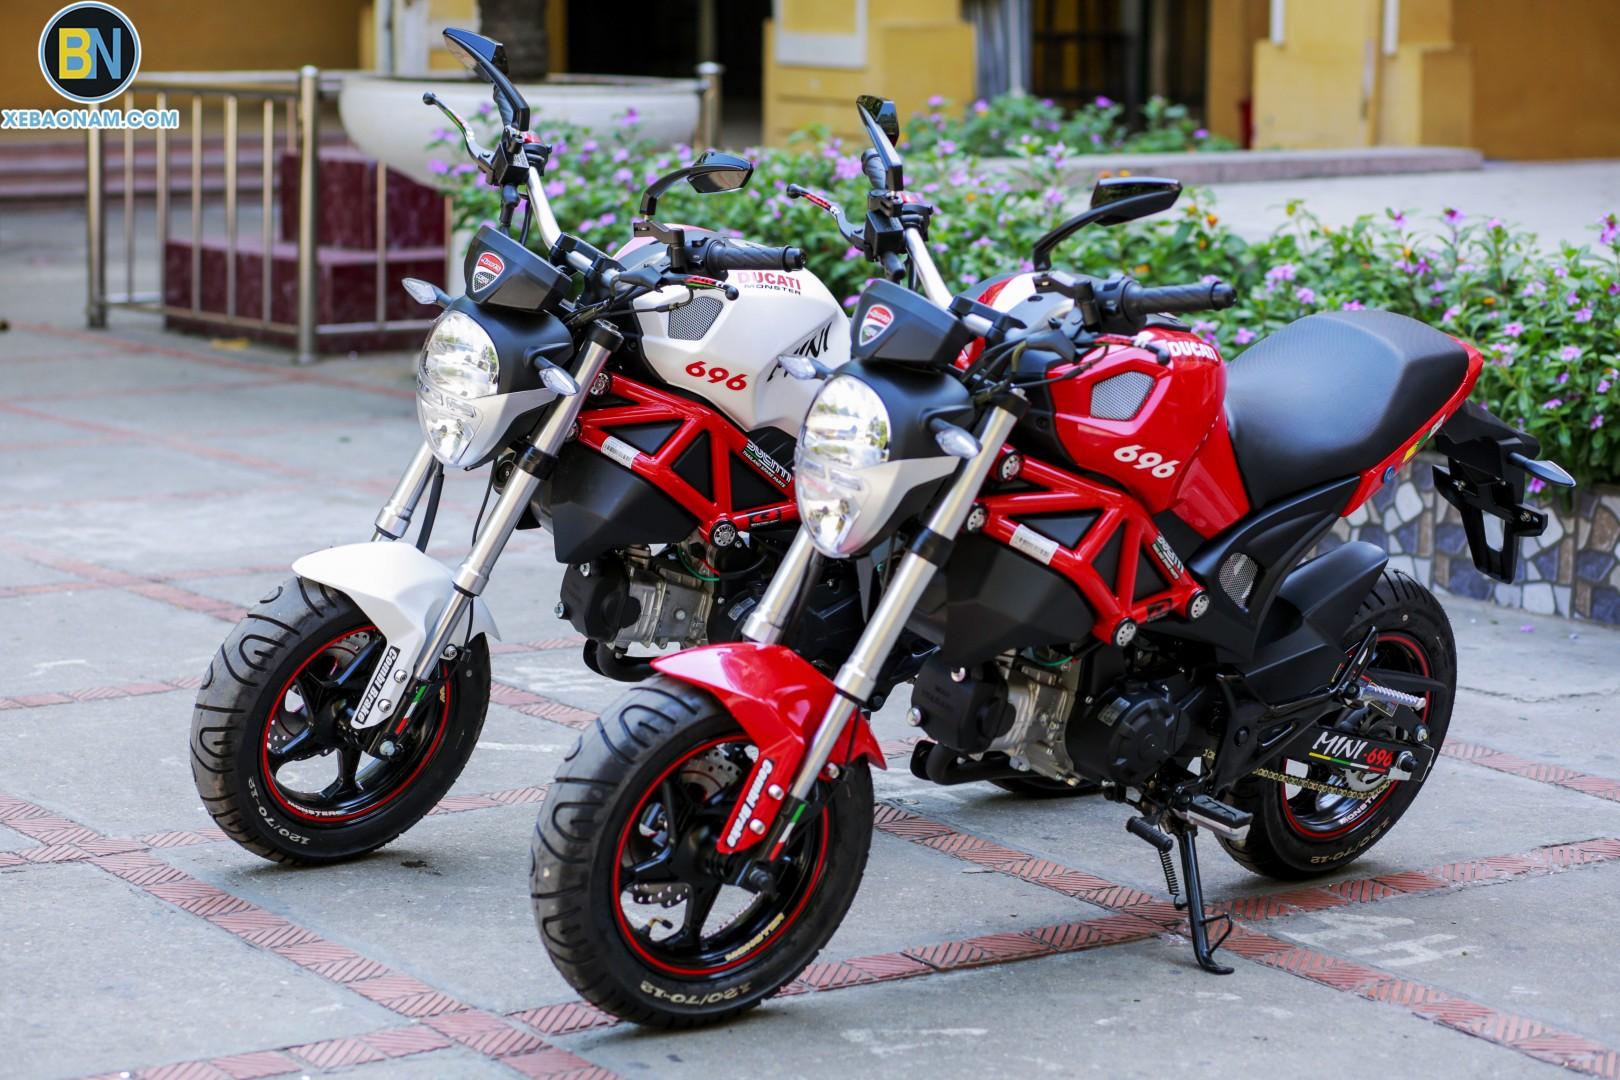 xe-may-ducati-mini-monster-110(2)